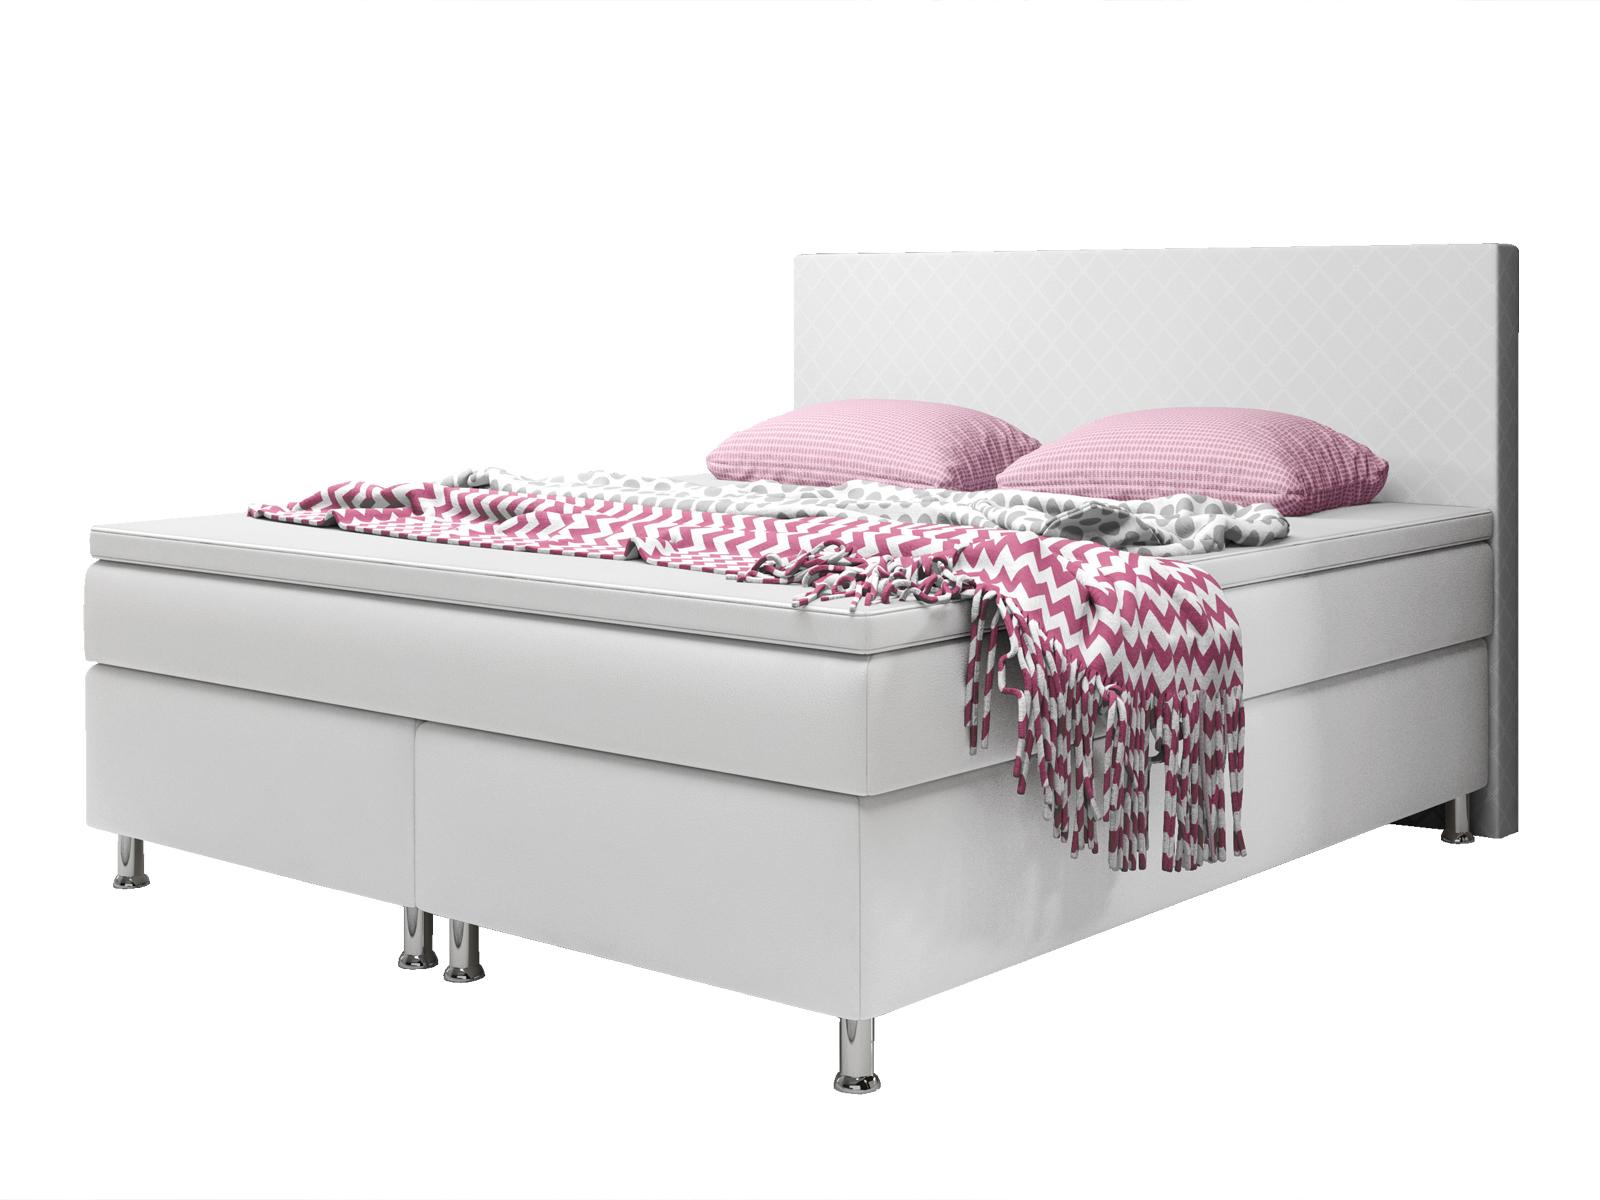 boxspringbett madrid 180x200 cm kunstleder wei schlafen boxspringbetten. Black Bedroom Furniture Sets. Home Design Ideas